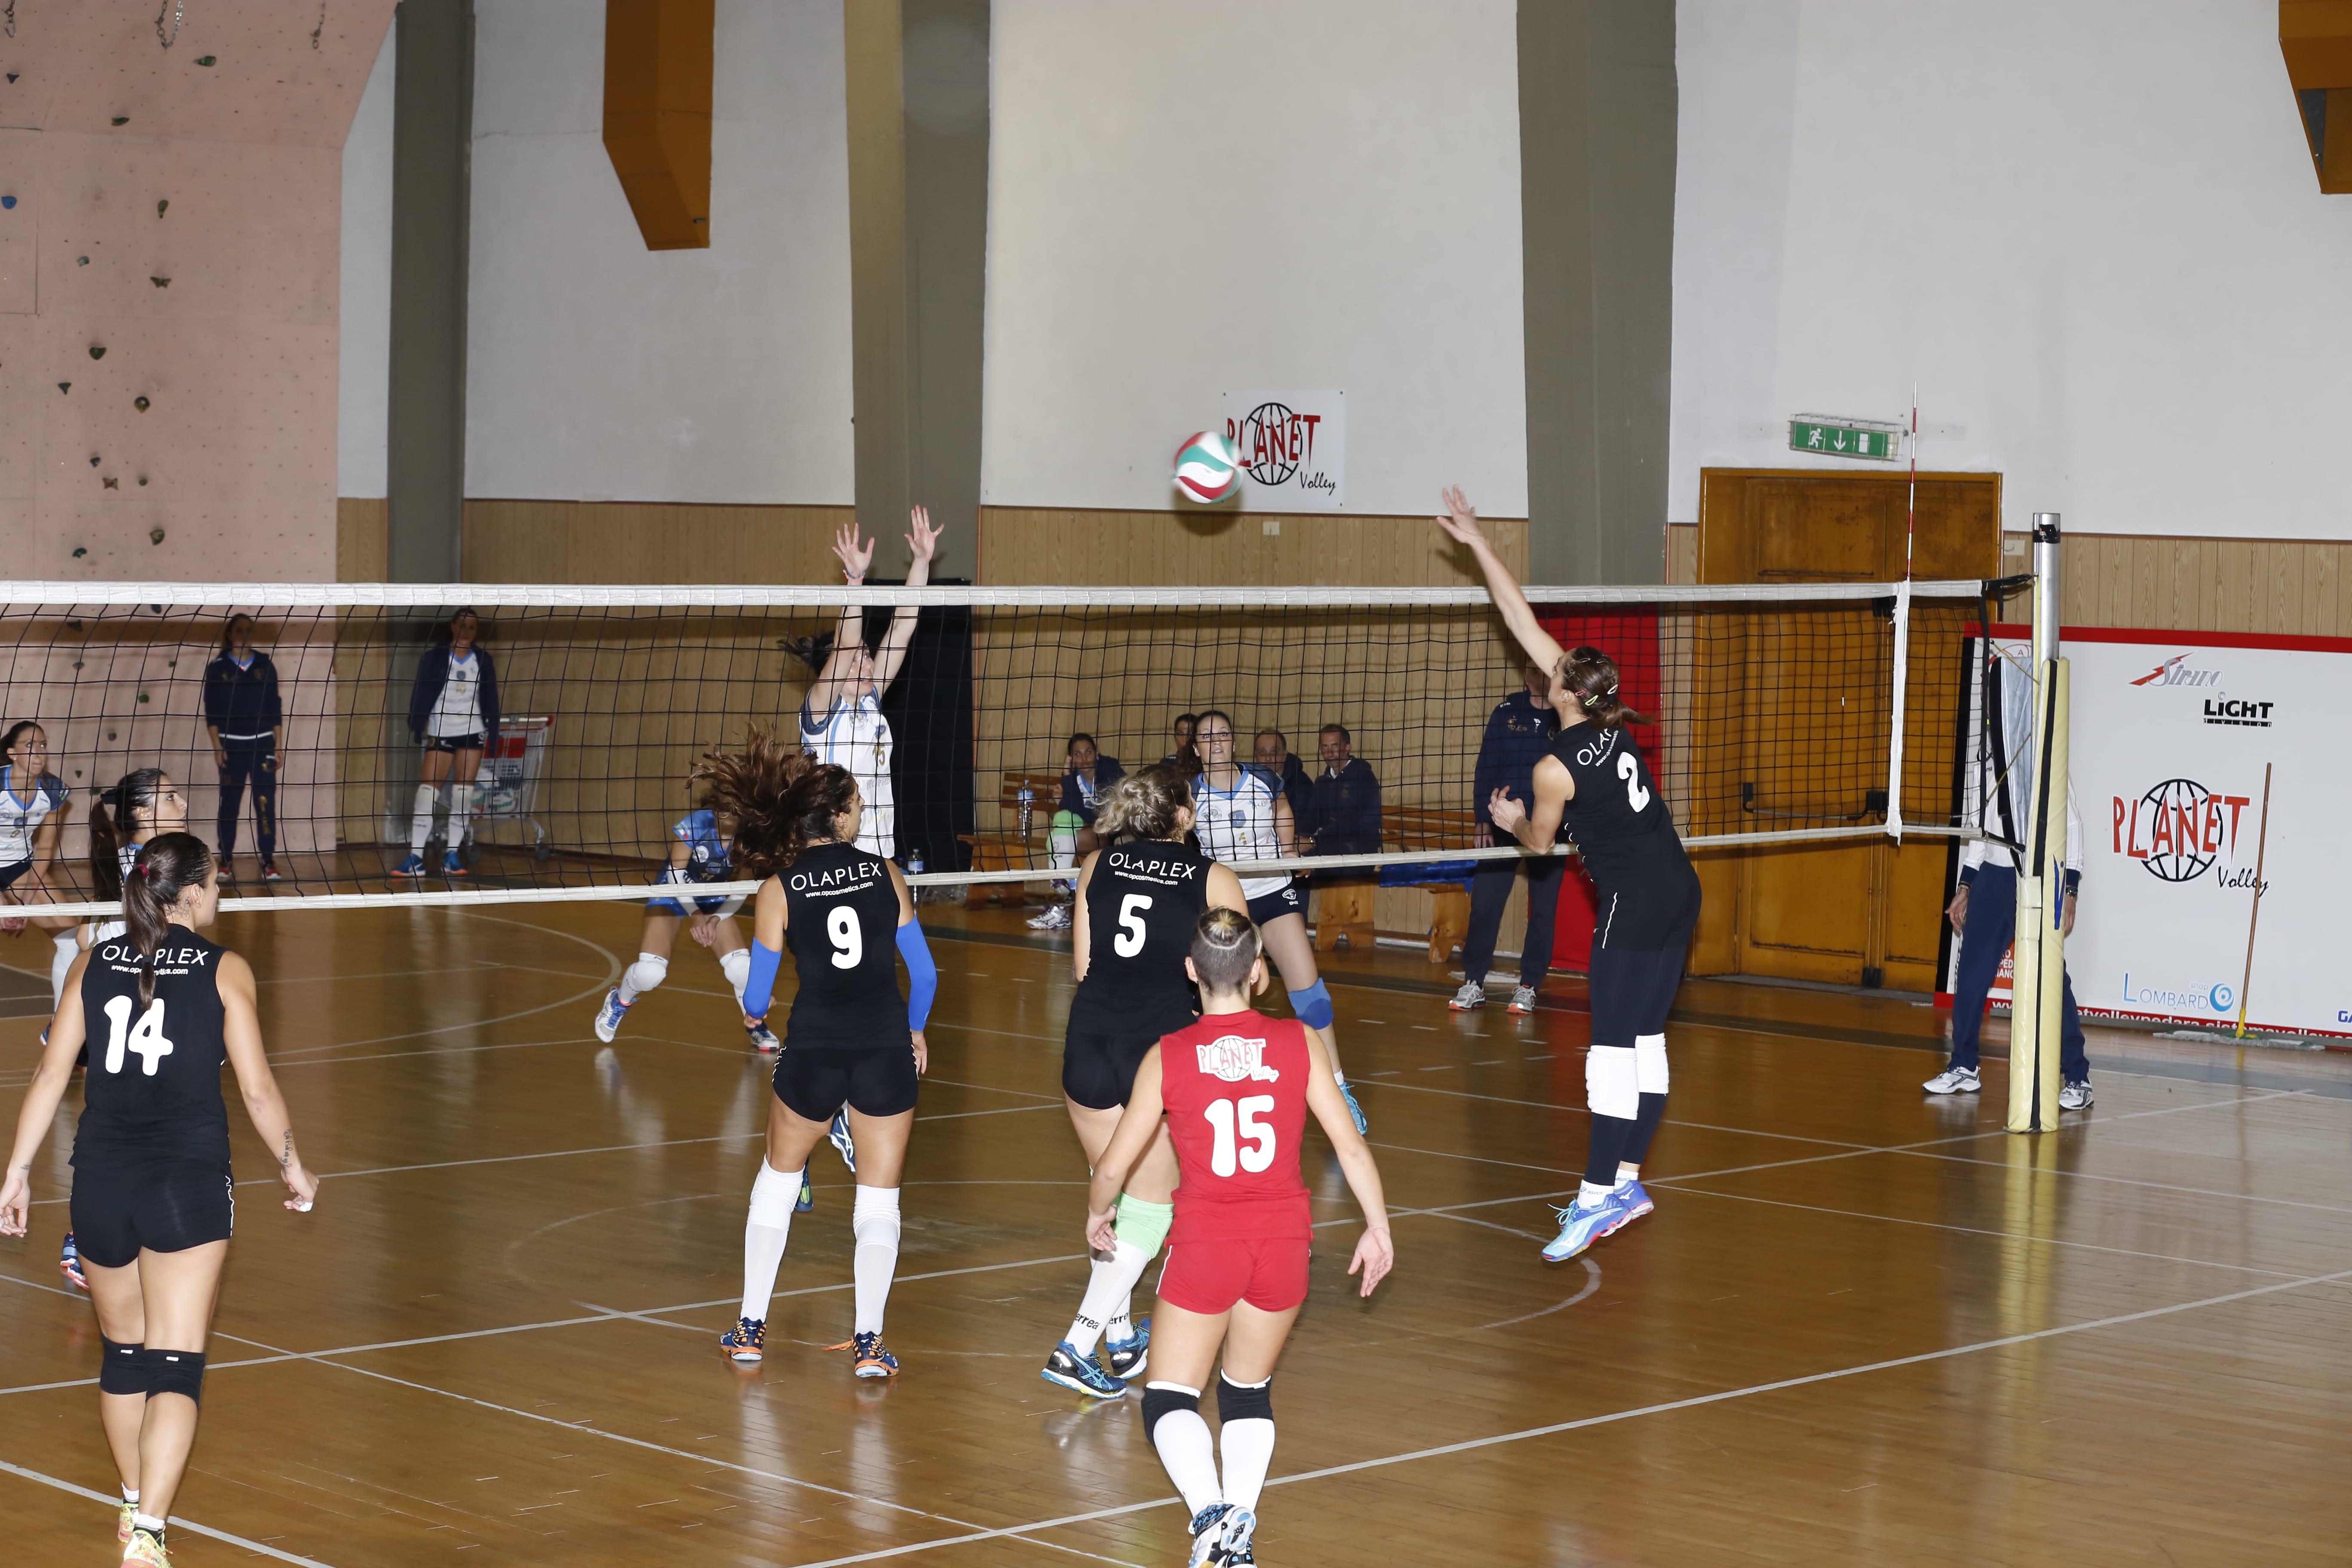 Partita 2 Planet Volley - OP e lo sport